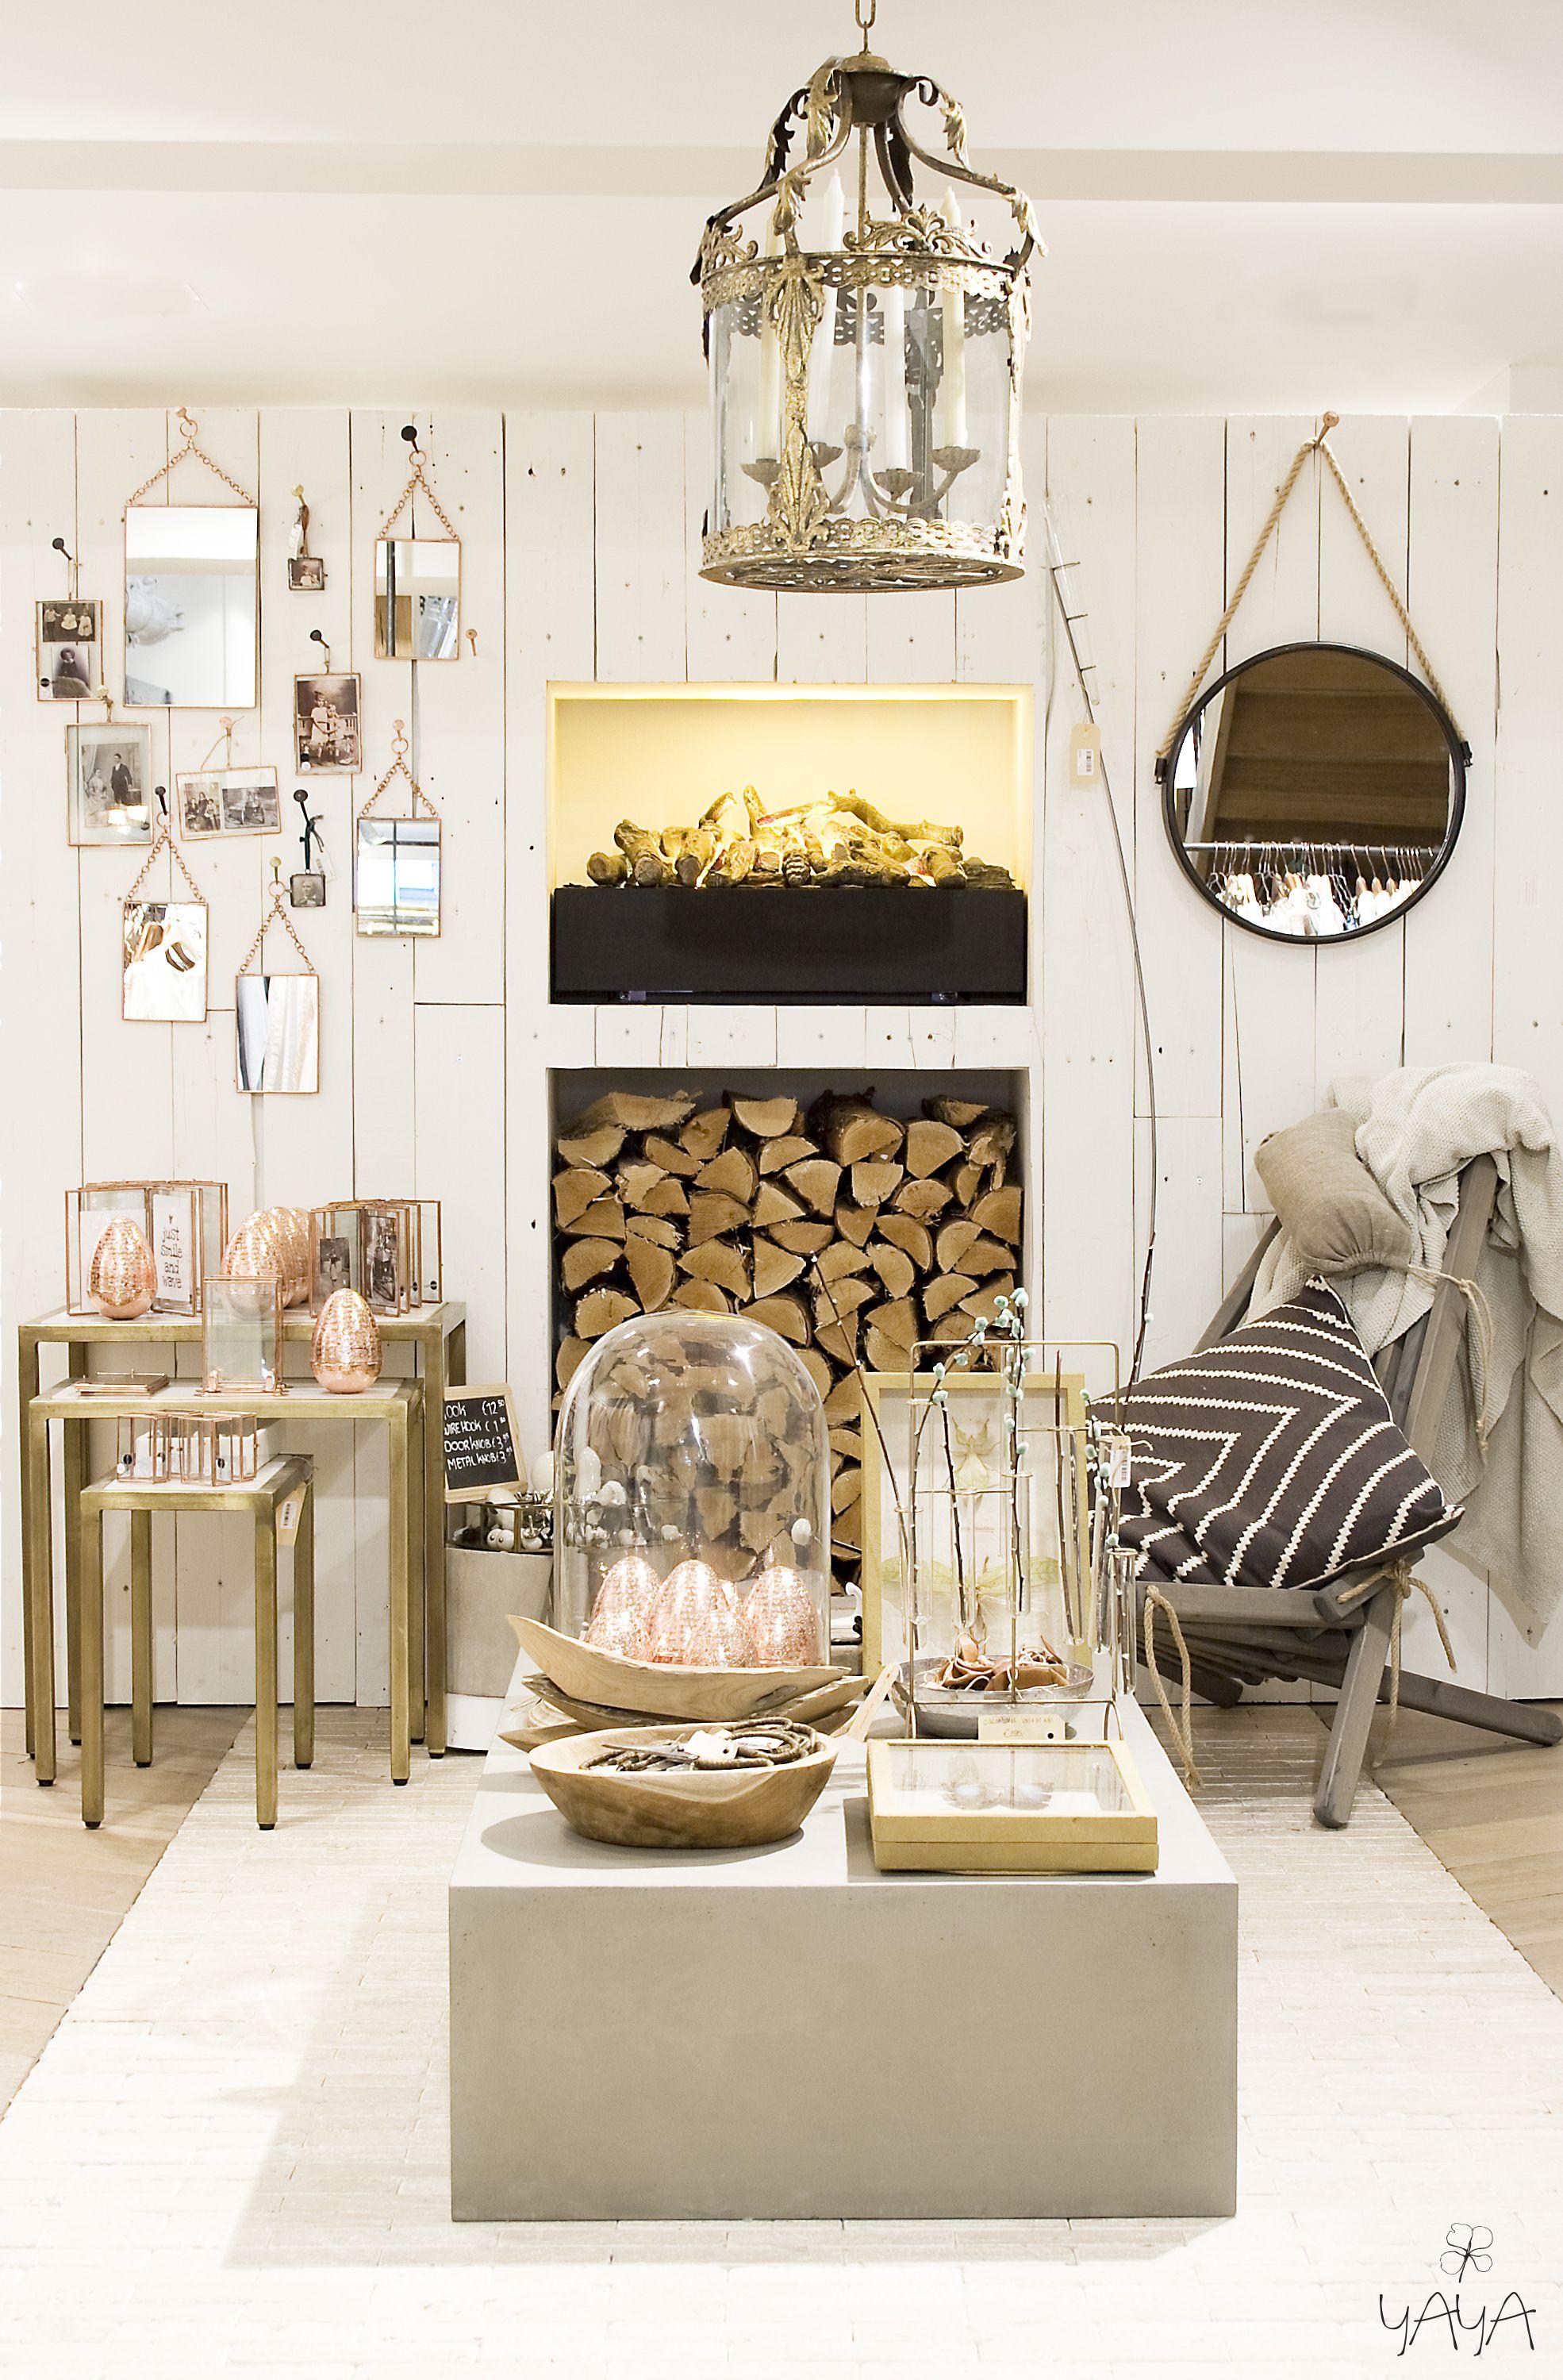 yaya concept store amstelveen pakhuis loft winkel interieurontwerp winkel interieur winkelpuien winkel